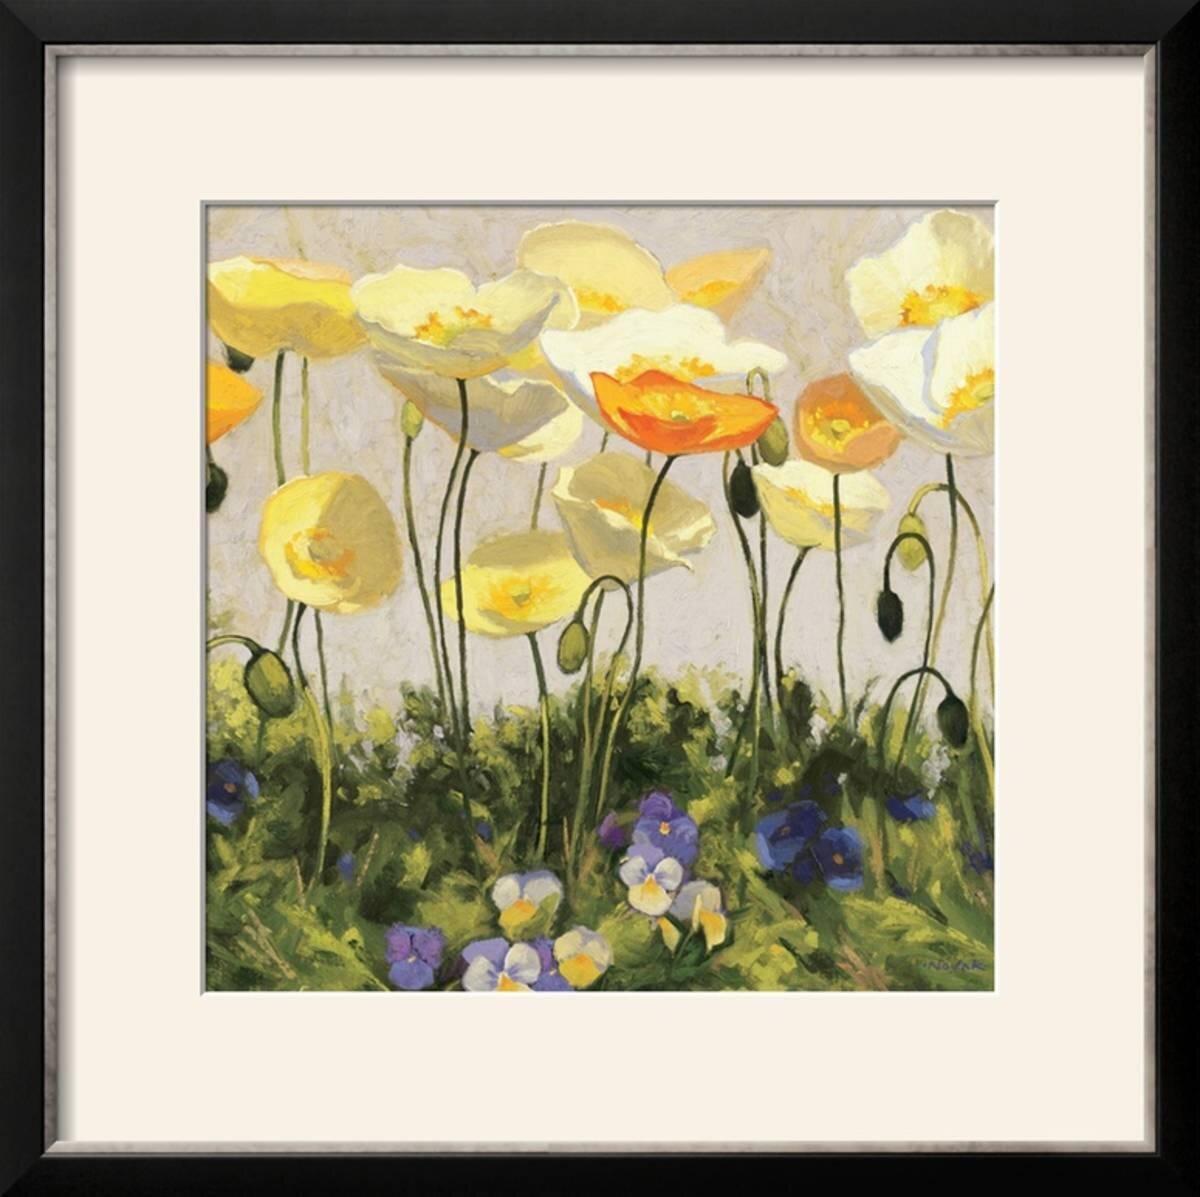 Charlton Home \'Poppies and Pansies II\' Framed Print   Wayfair